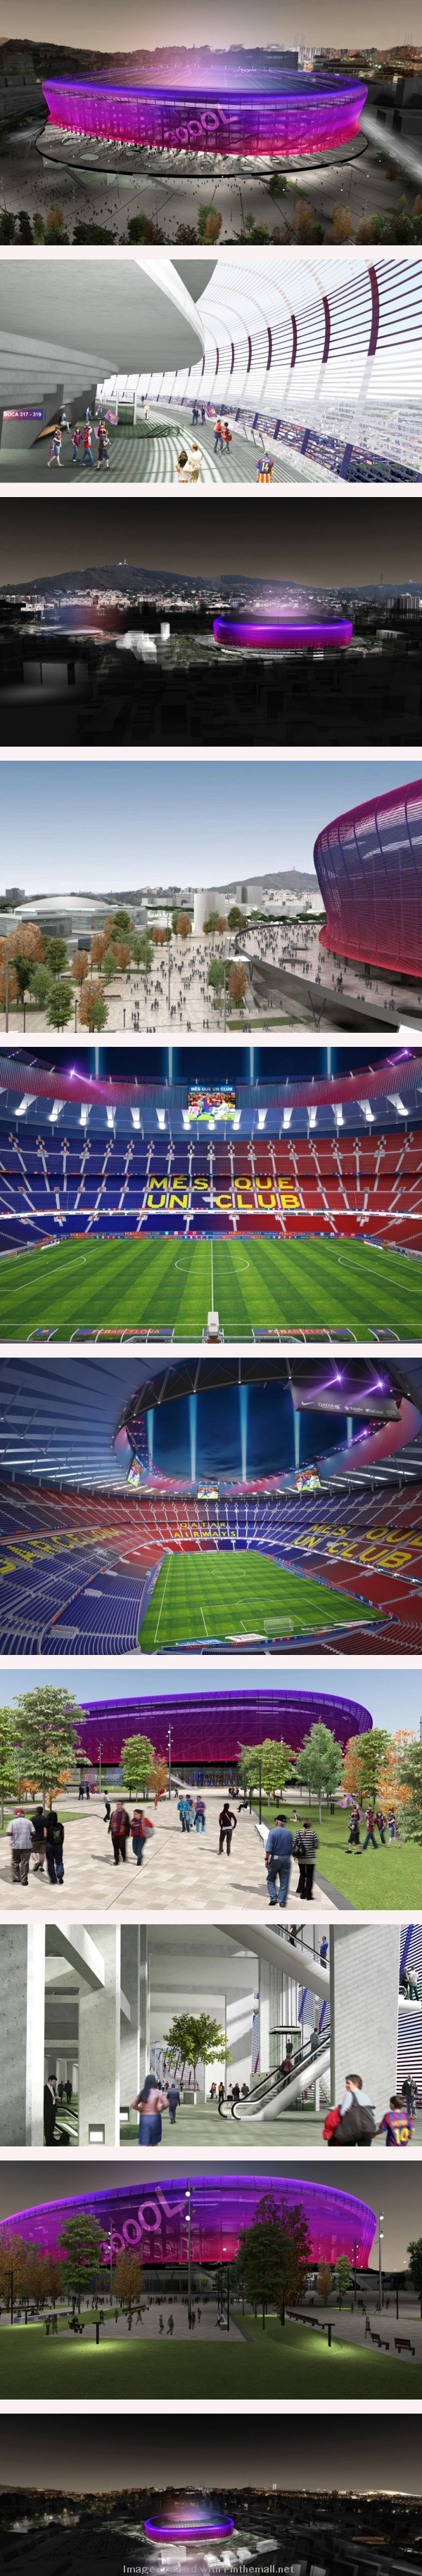 Estadi: New Camp Nou conceptual drawings - created via http://pinthemall.net